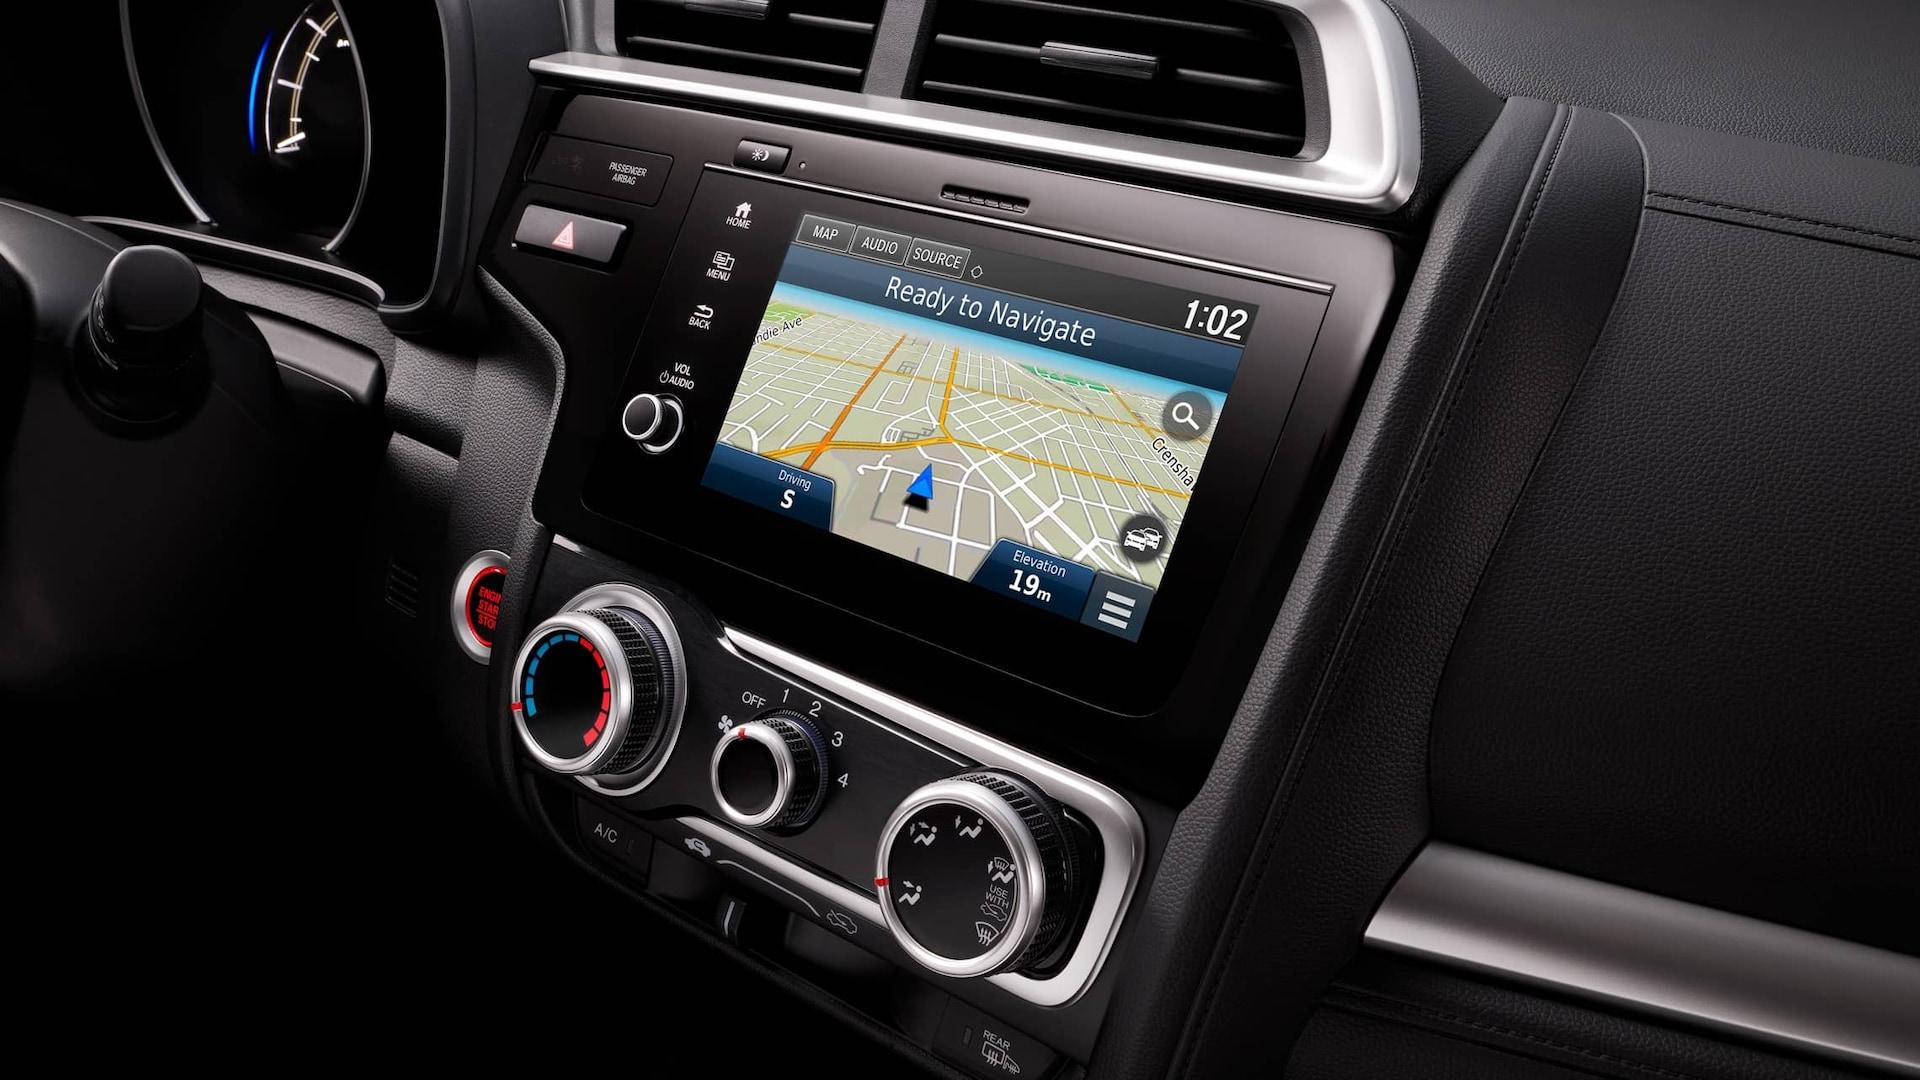 Detalle del sistema de audio en pantalla con Honda Satellite-Linked Navigation System™ en el Honda Fit2019.